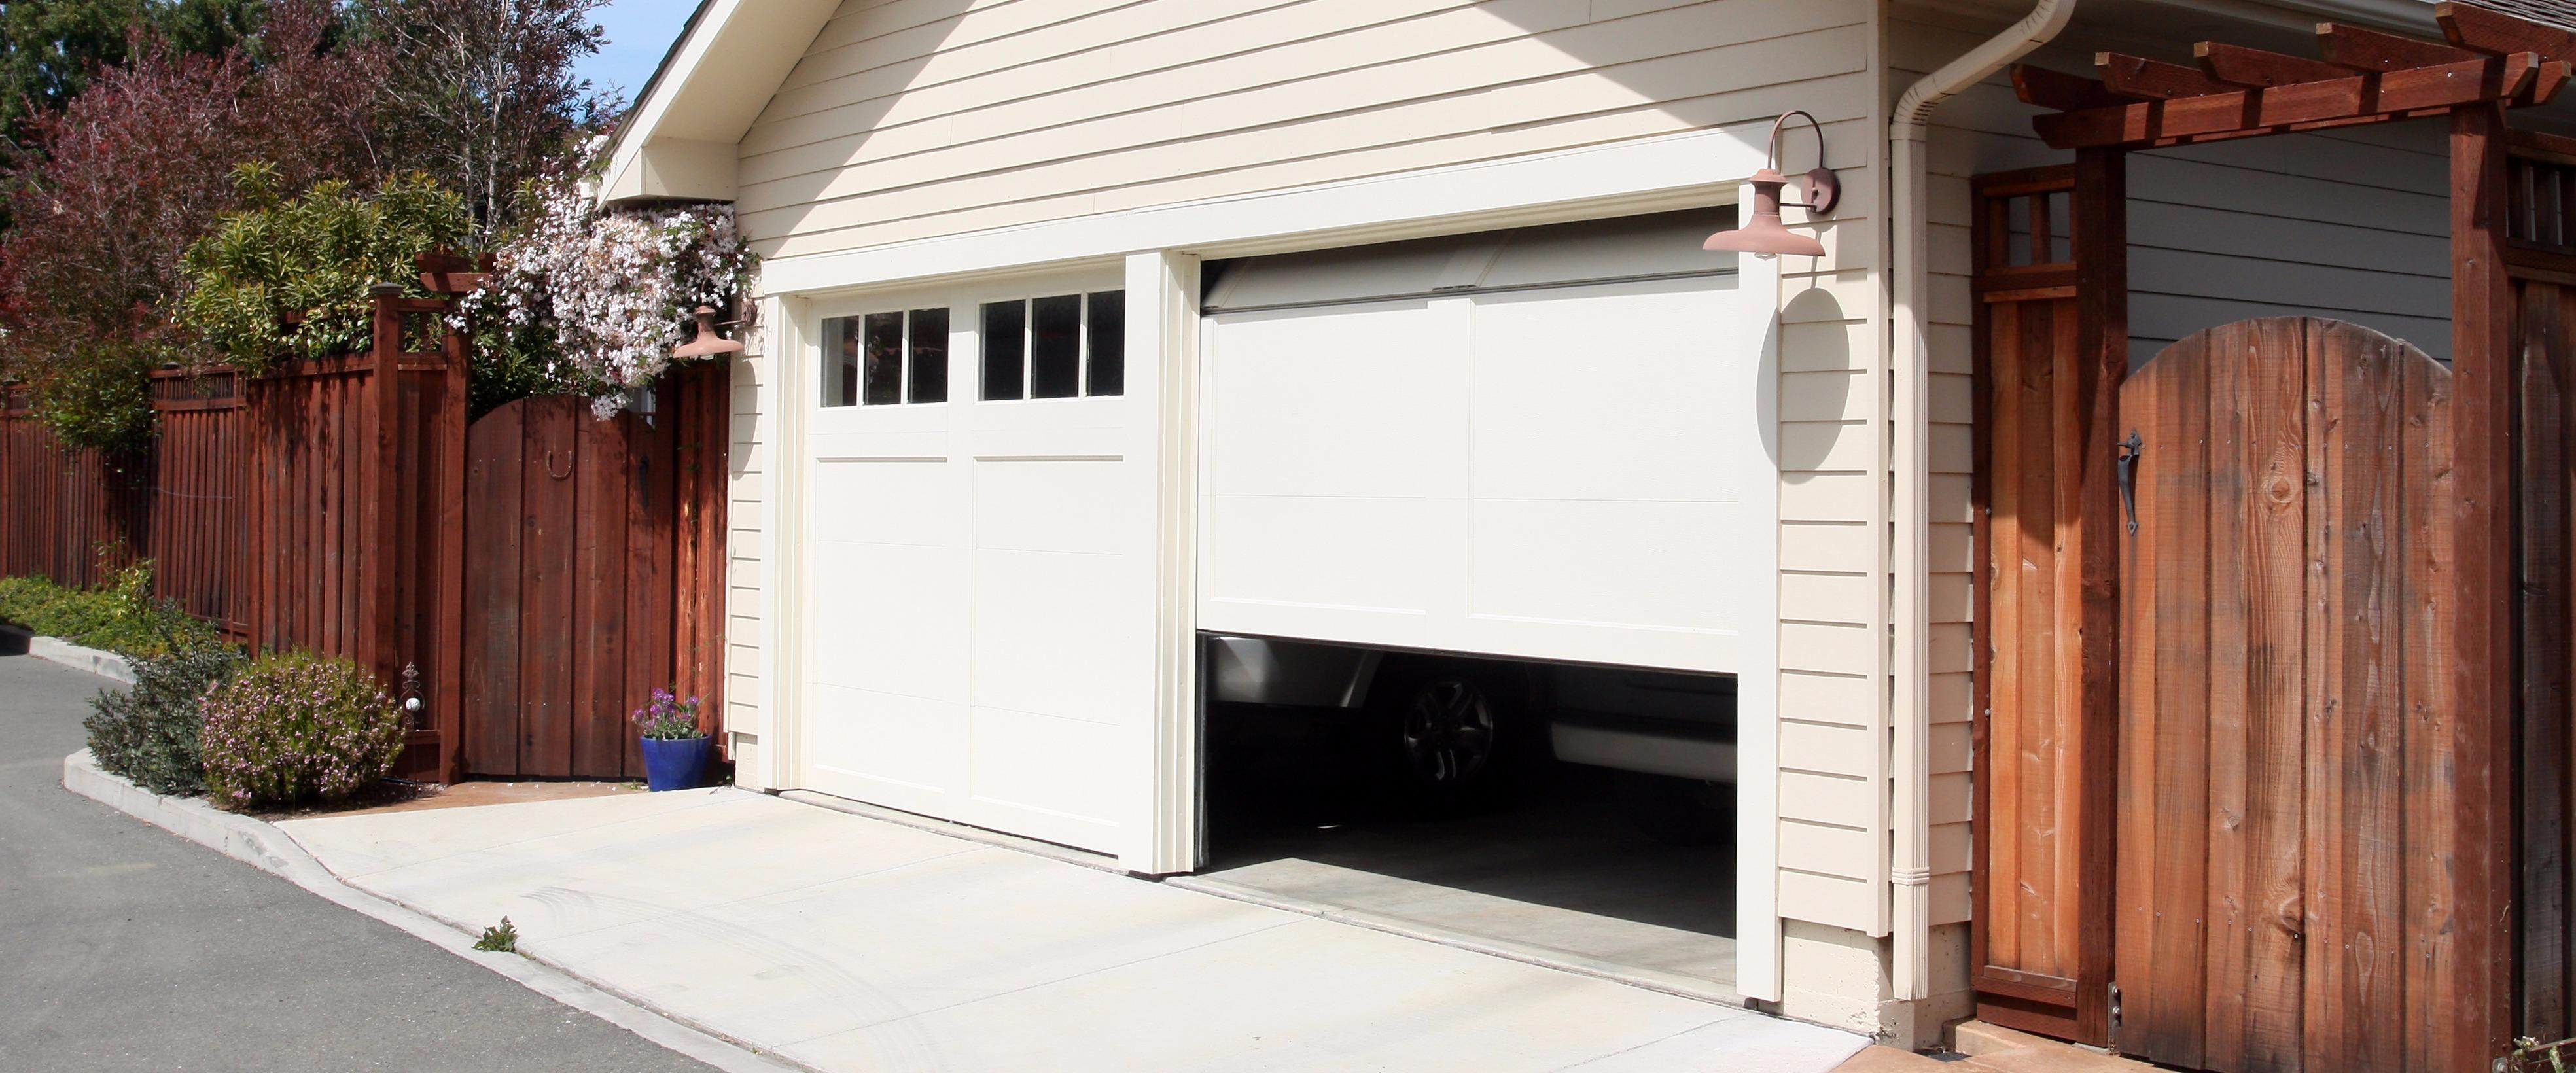 doors by garage door for oregon shed semon in central made bend custom